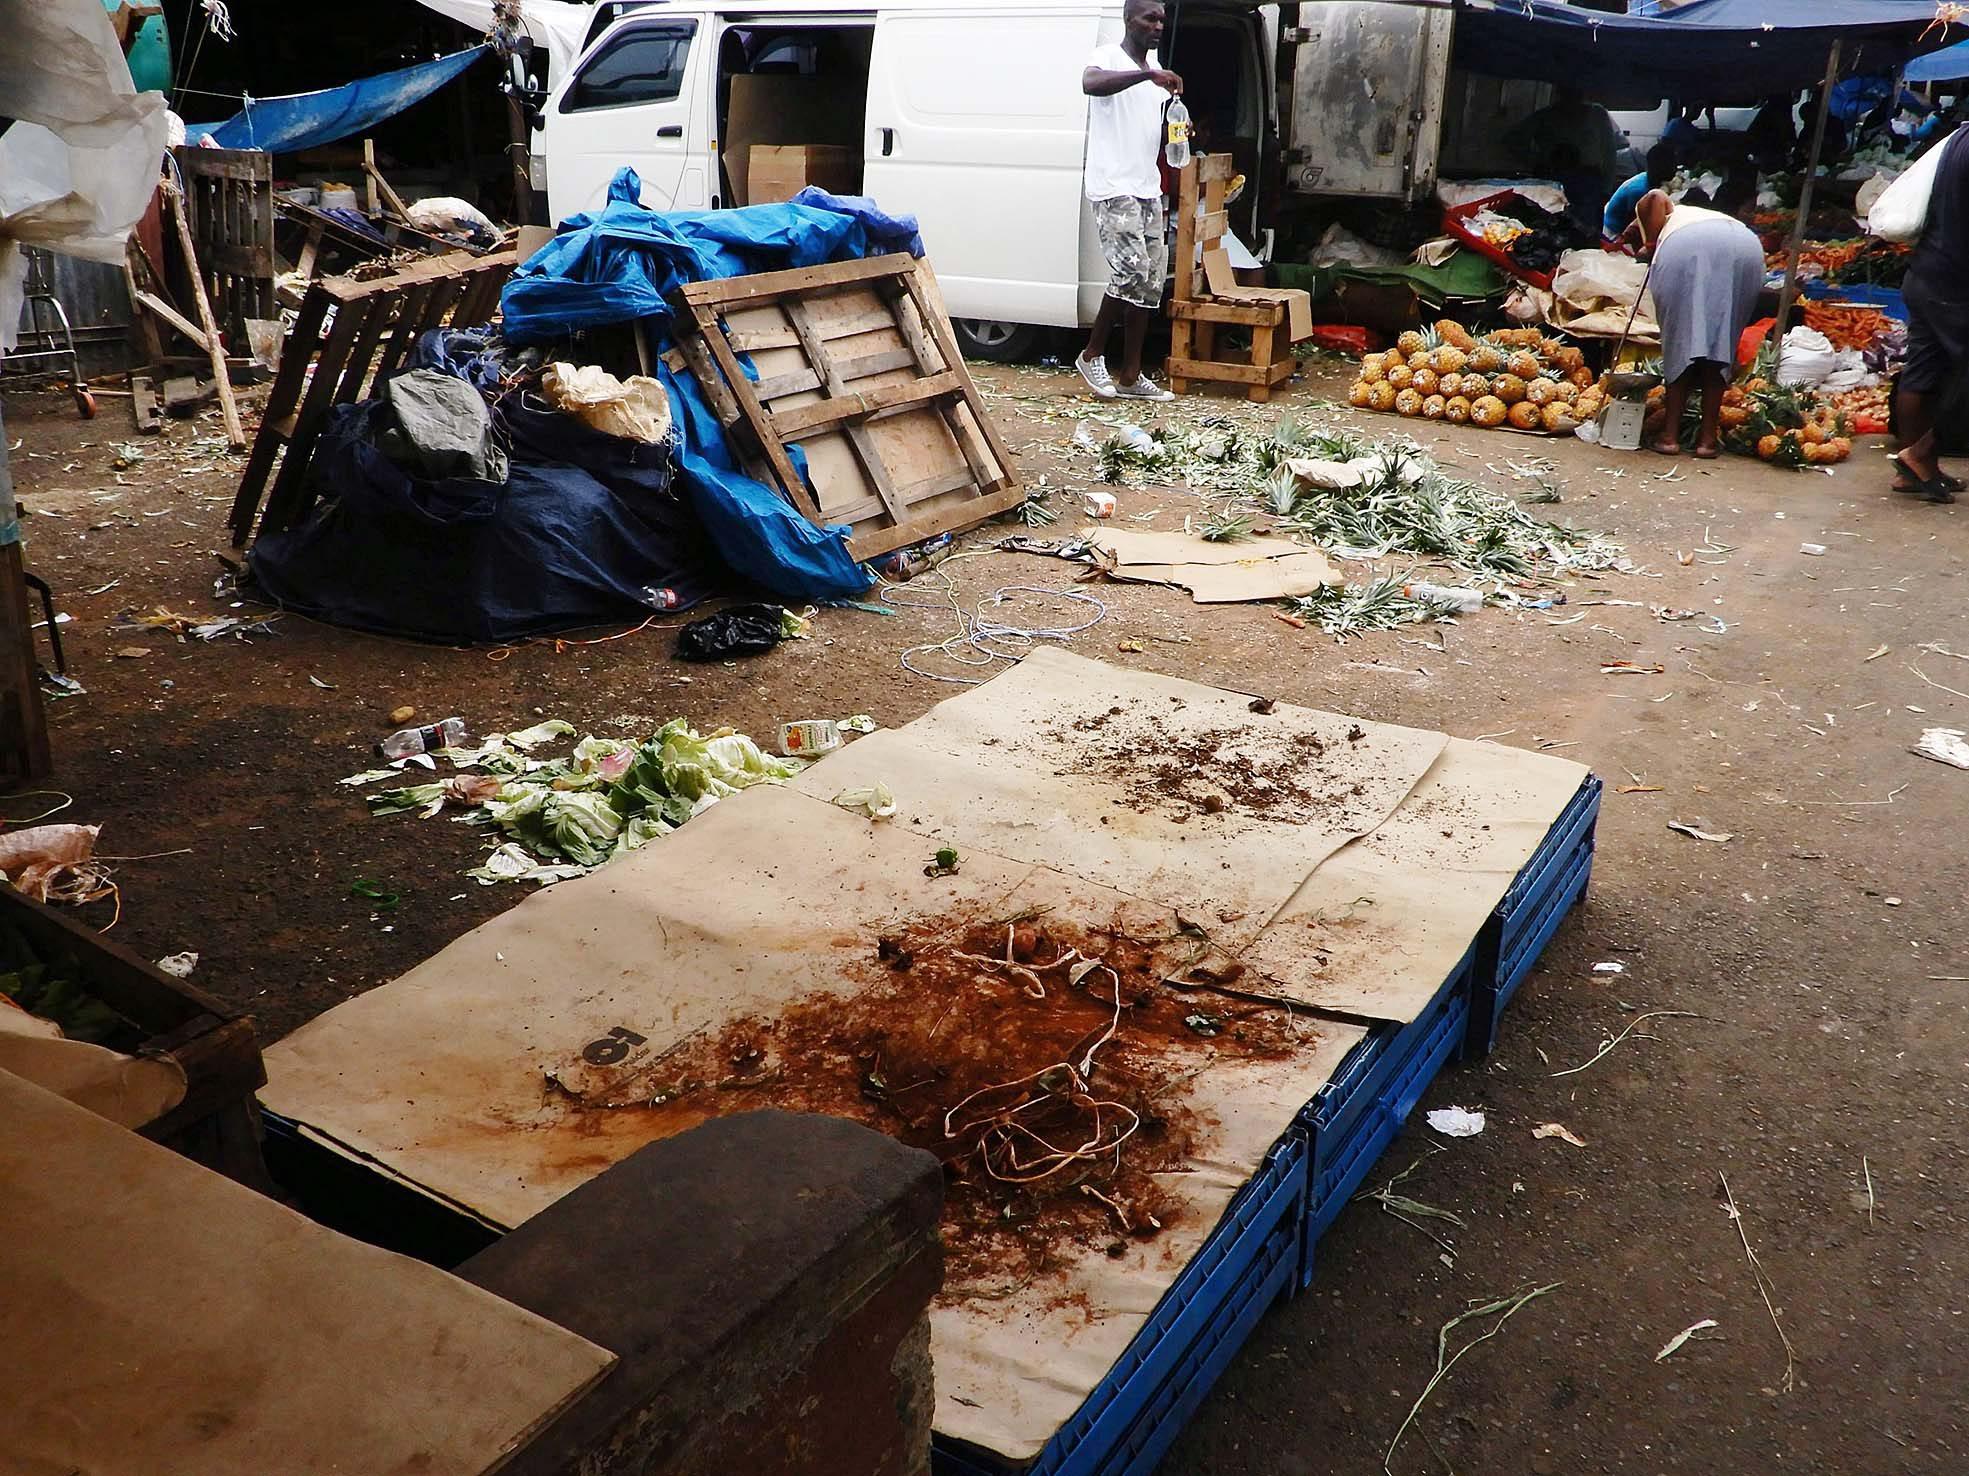 Latest killings leave market vendors fearful